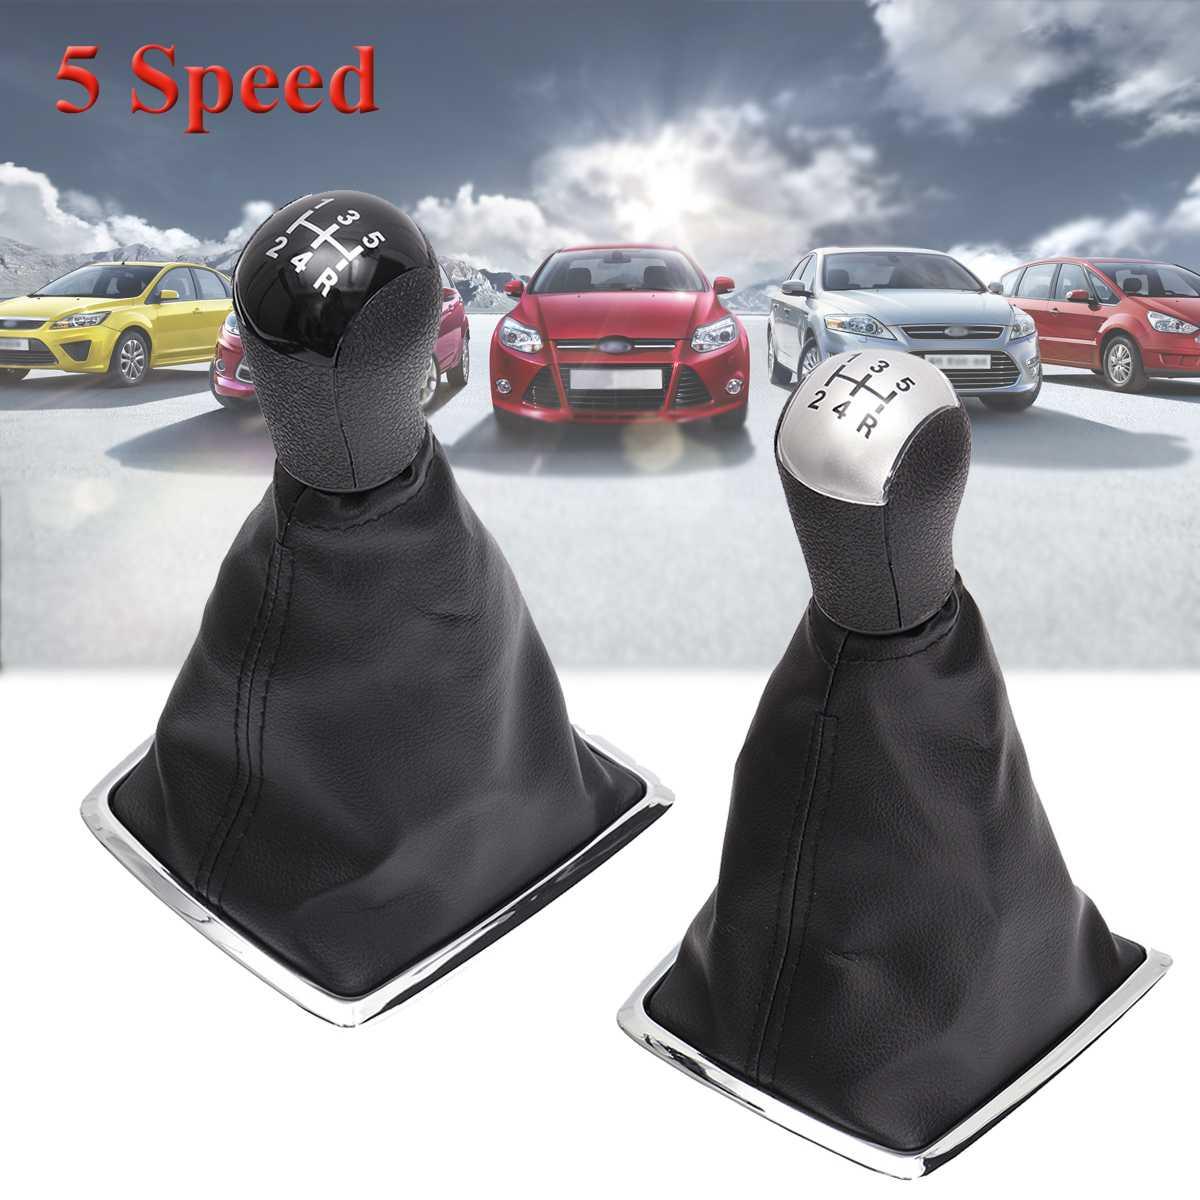 Vauxhall Zafira B MK2 2005 to 2014 All Models Steering Rack Boot Kit Gaiters